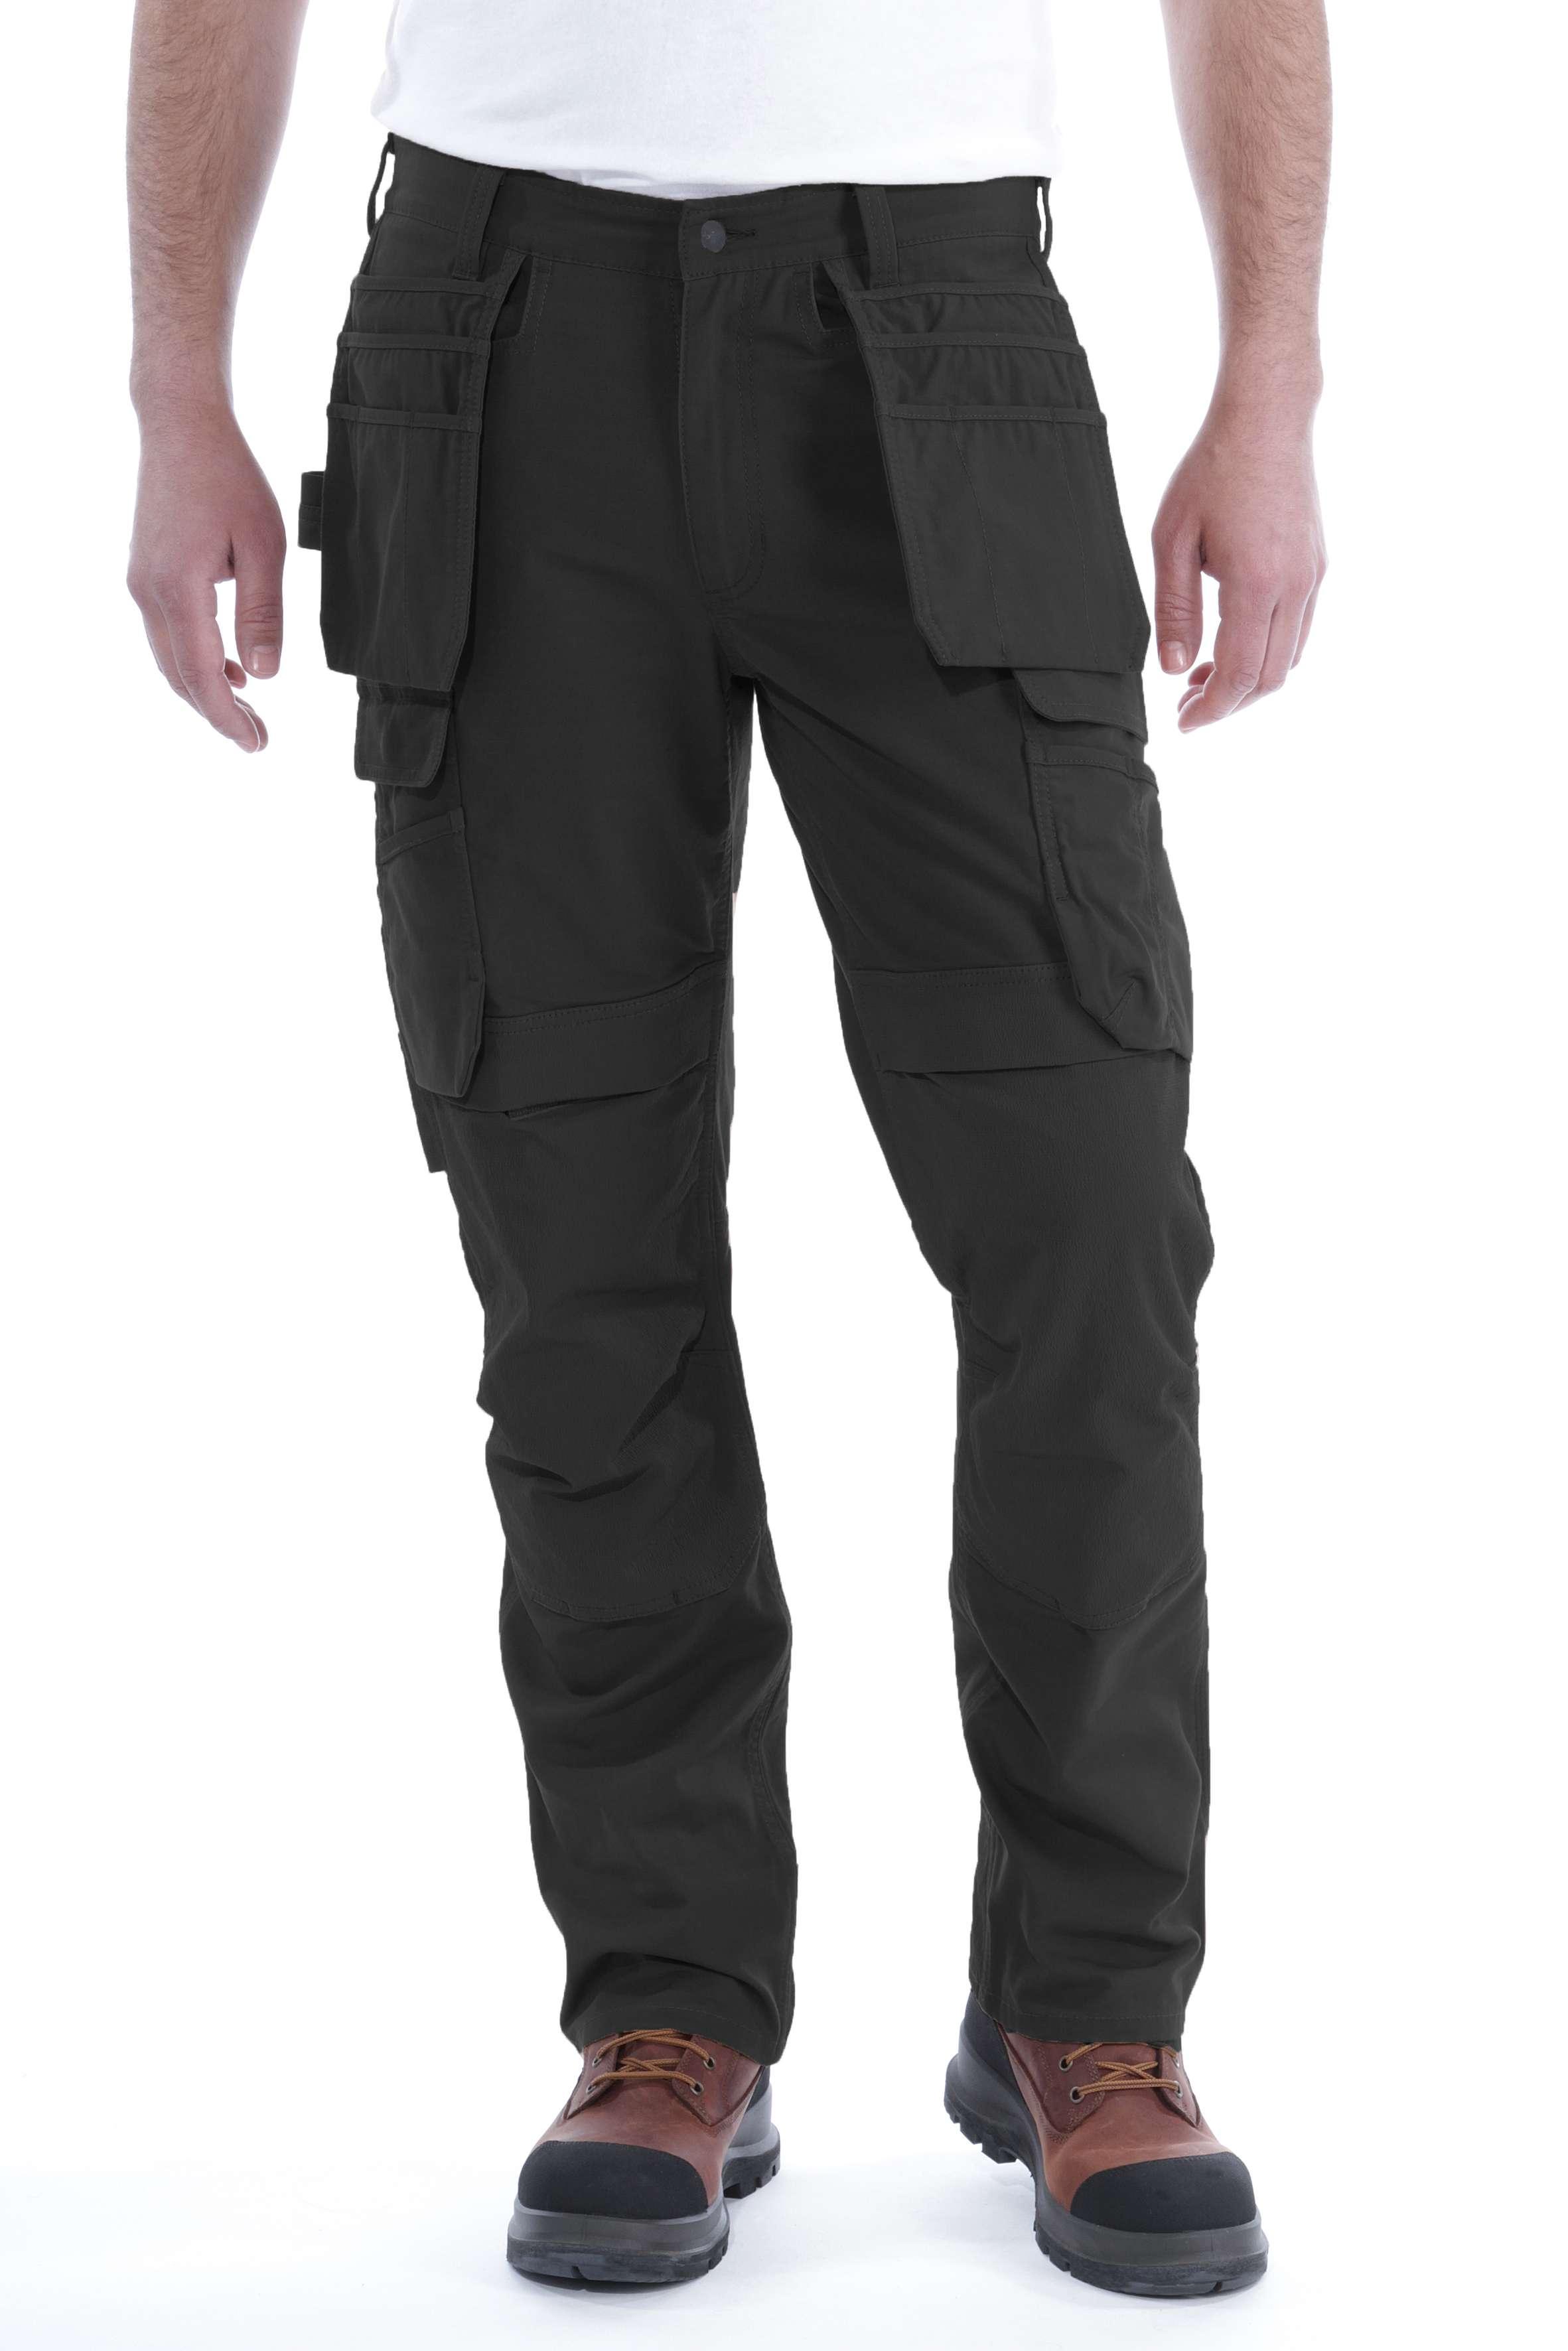 Carhartt Rugged Flex Steel Cargo Multi-Pocket Pant